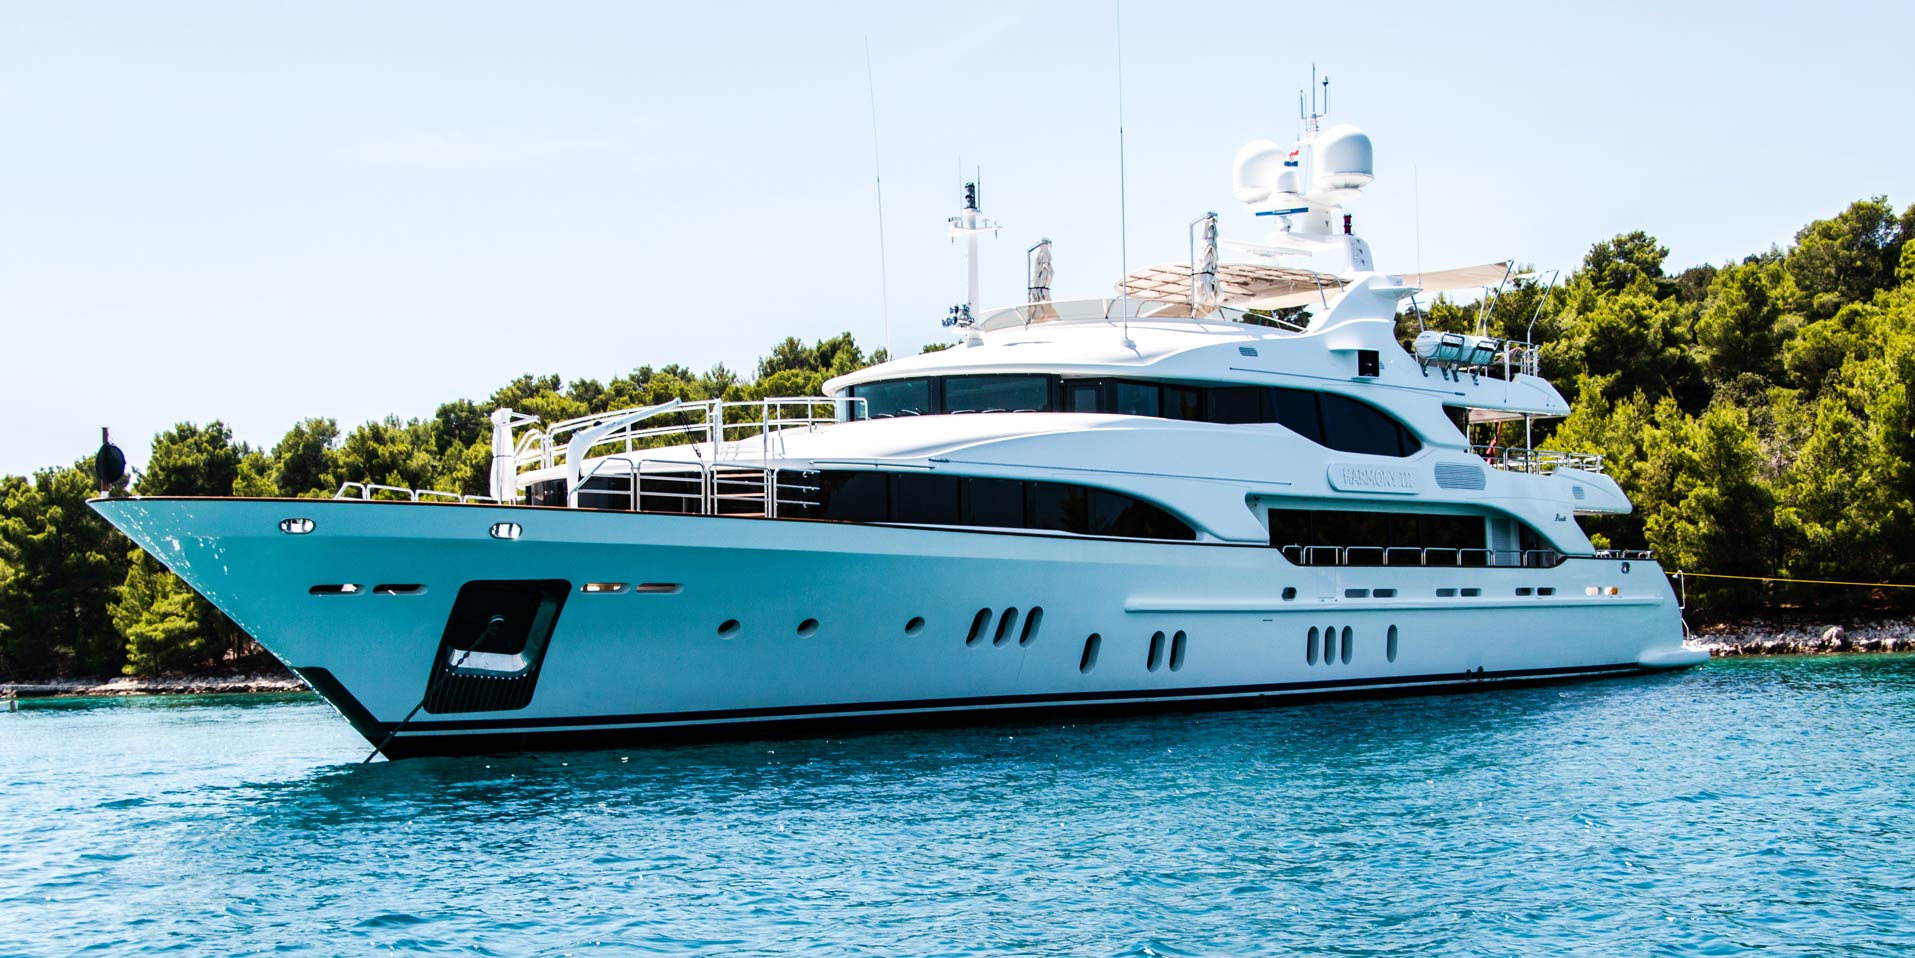 Yacht sitting on calm ocean water